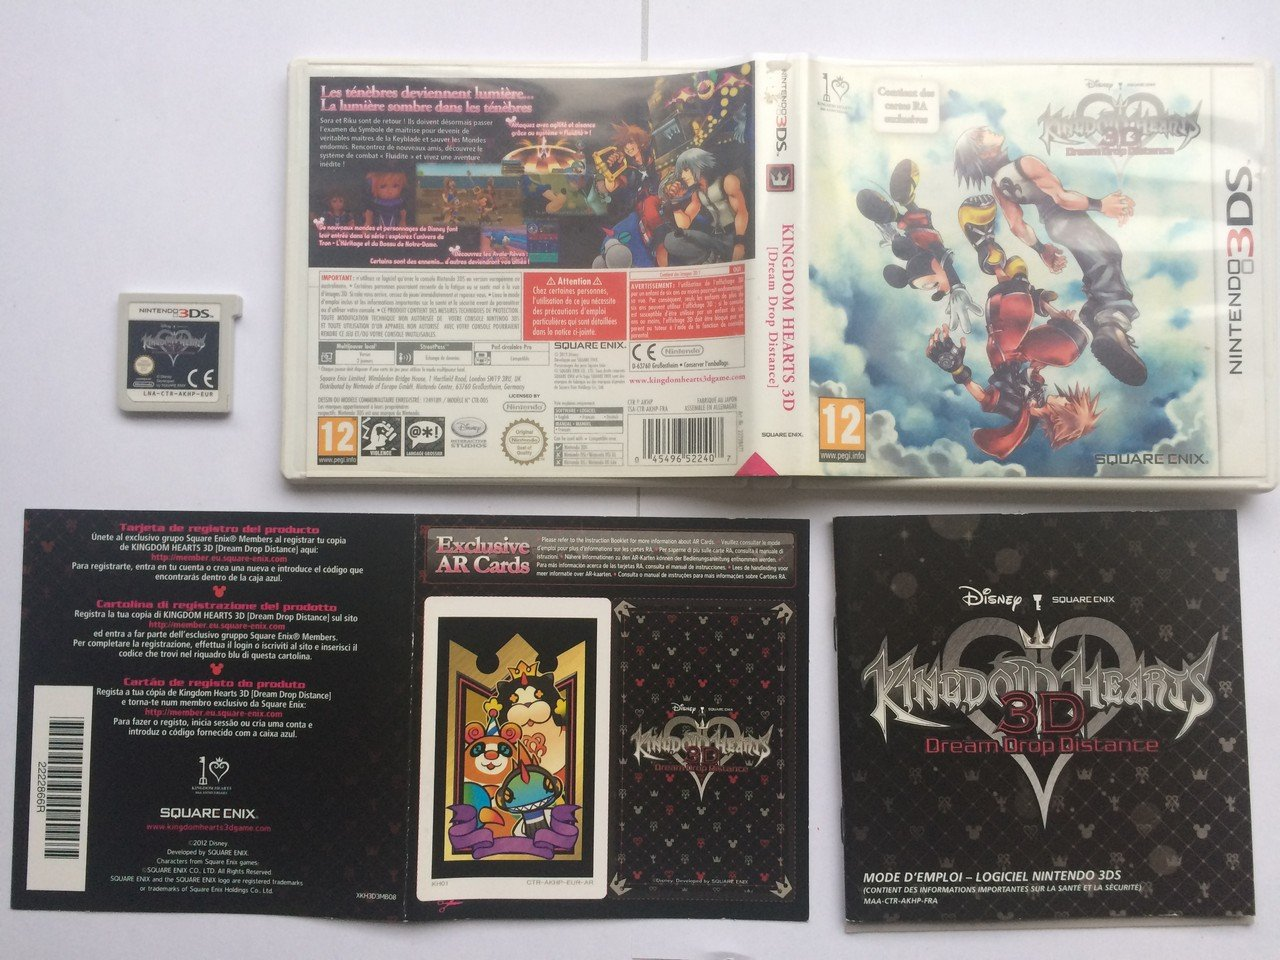 Amazon.com: Kingdom Hearts 3D: Dream Drop Distance /3DS by ...